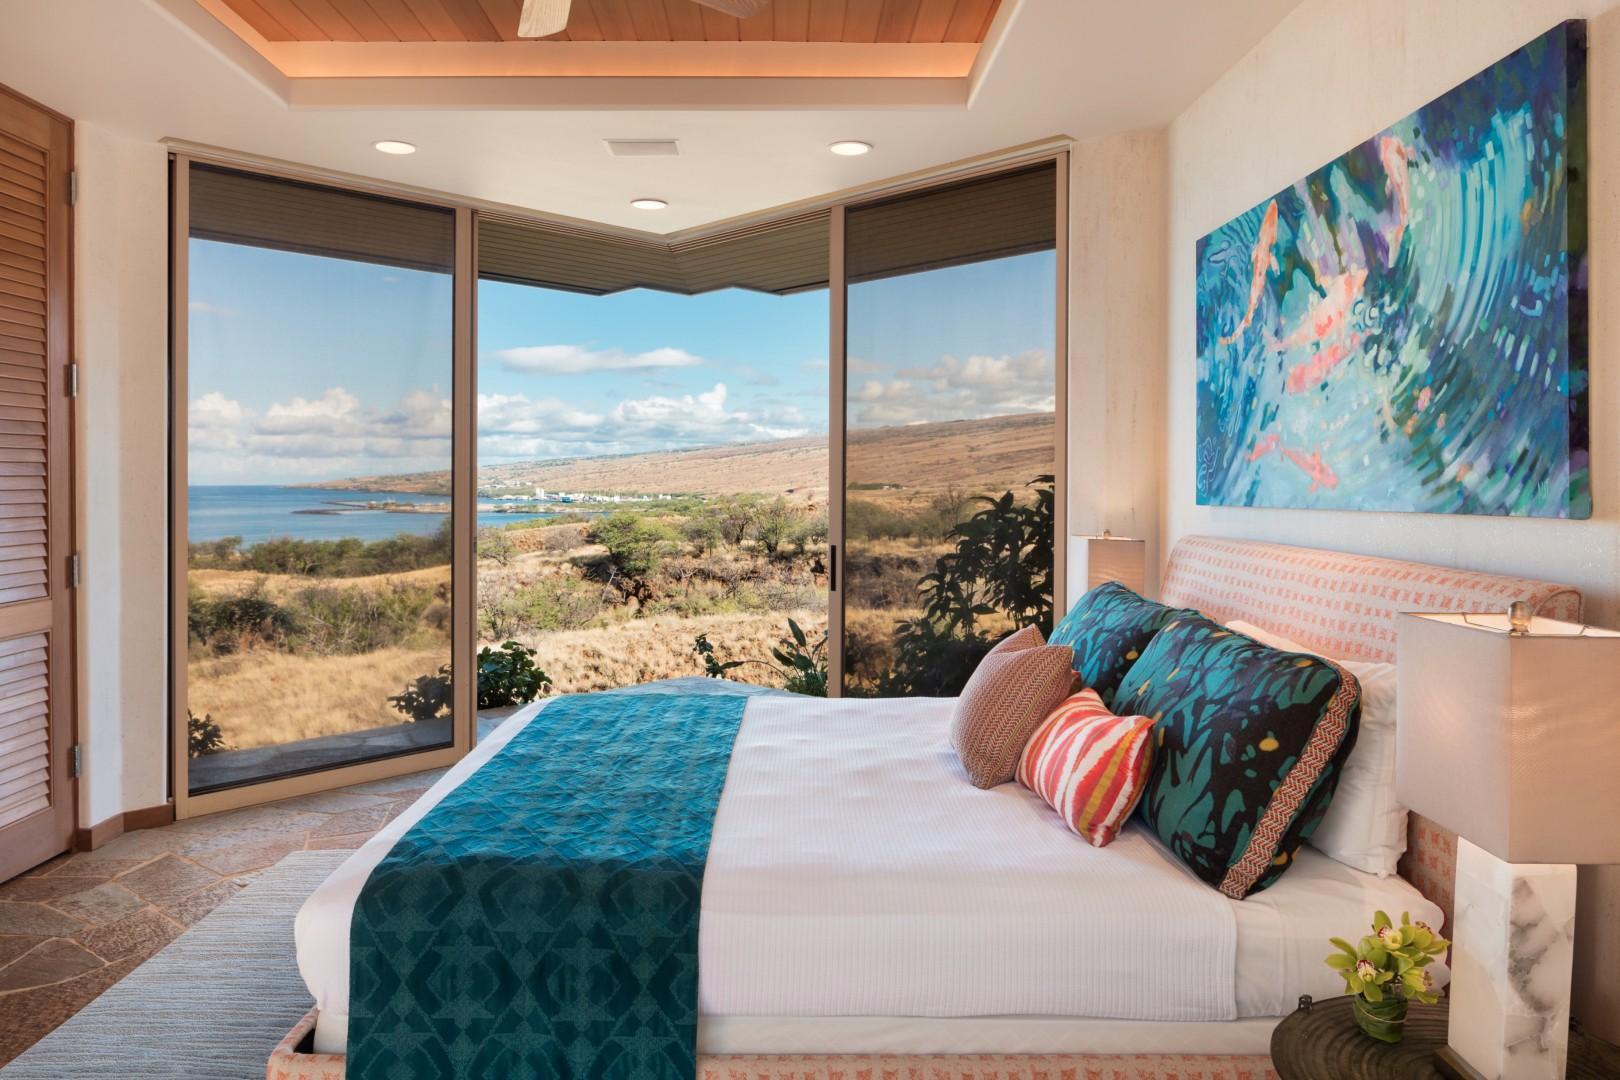 Third bedroom with king bed, sliding glass doors, ocean views, flat-screen TV, and en suite bath.